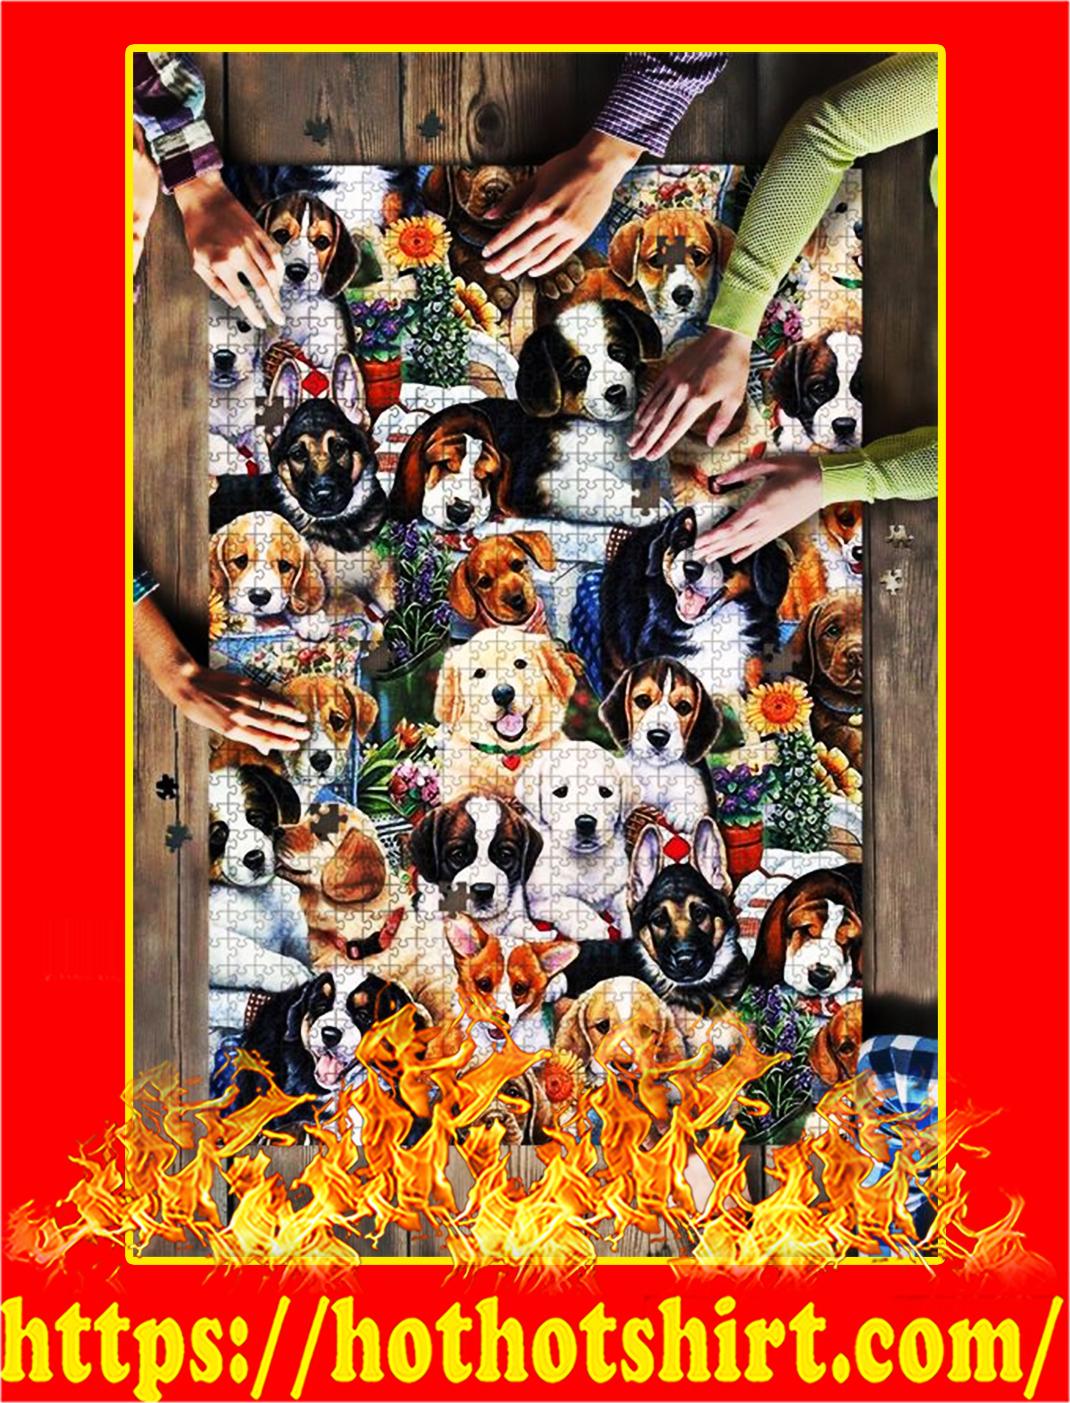 Dog Breeds Garden Jigsaw Puzzle - 500 pieces